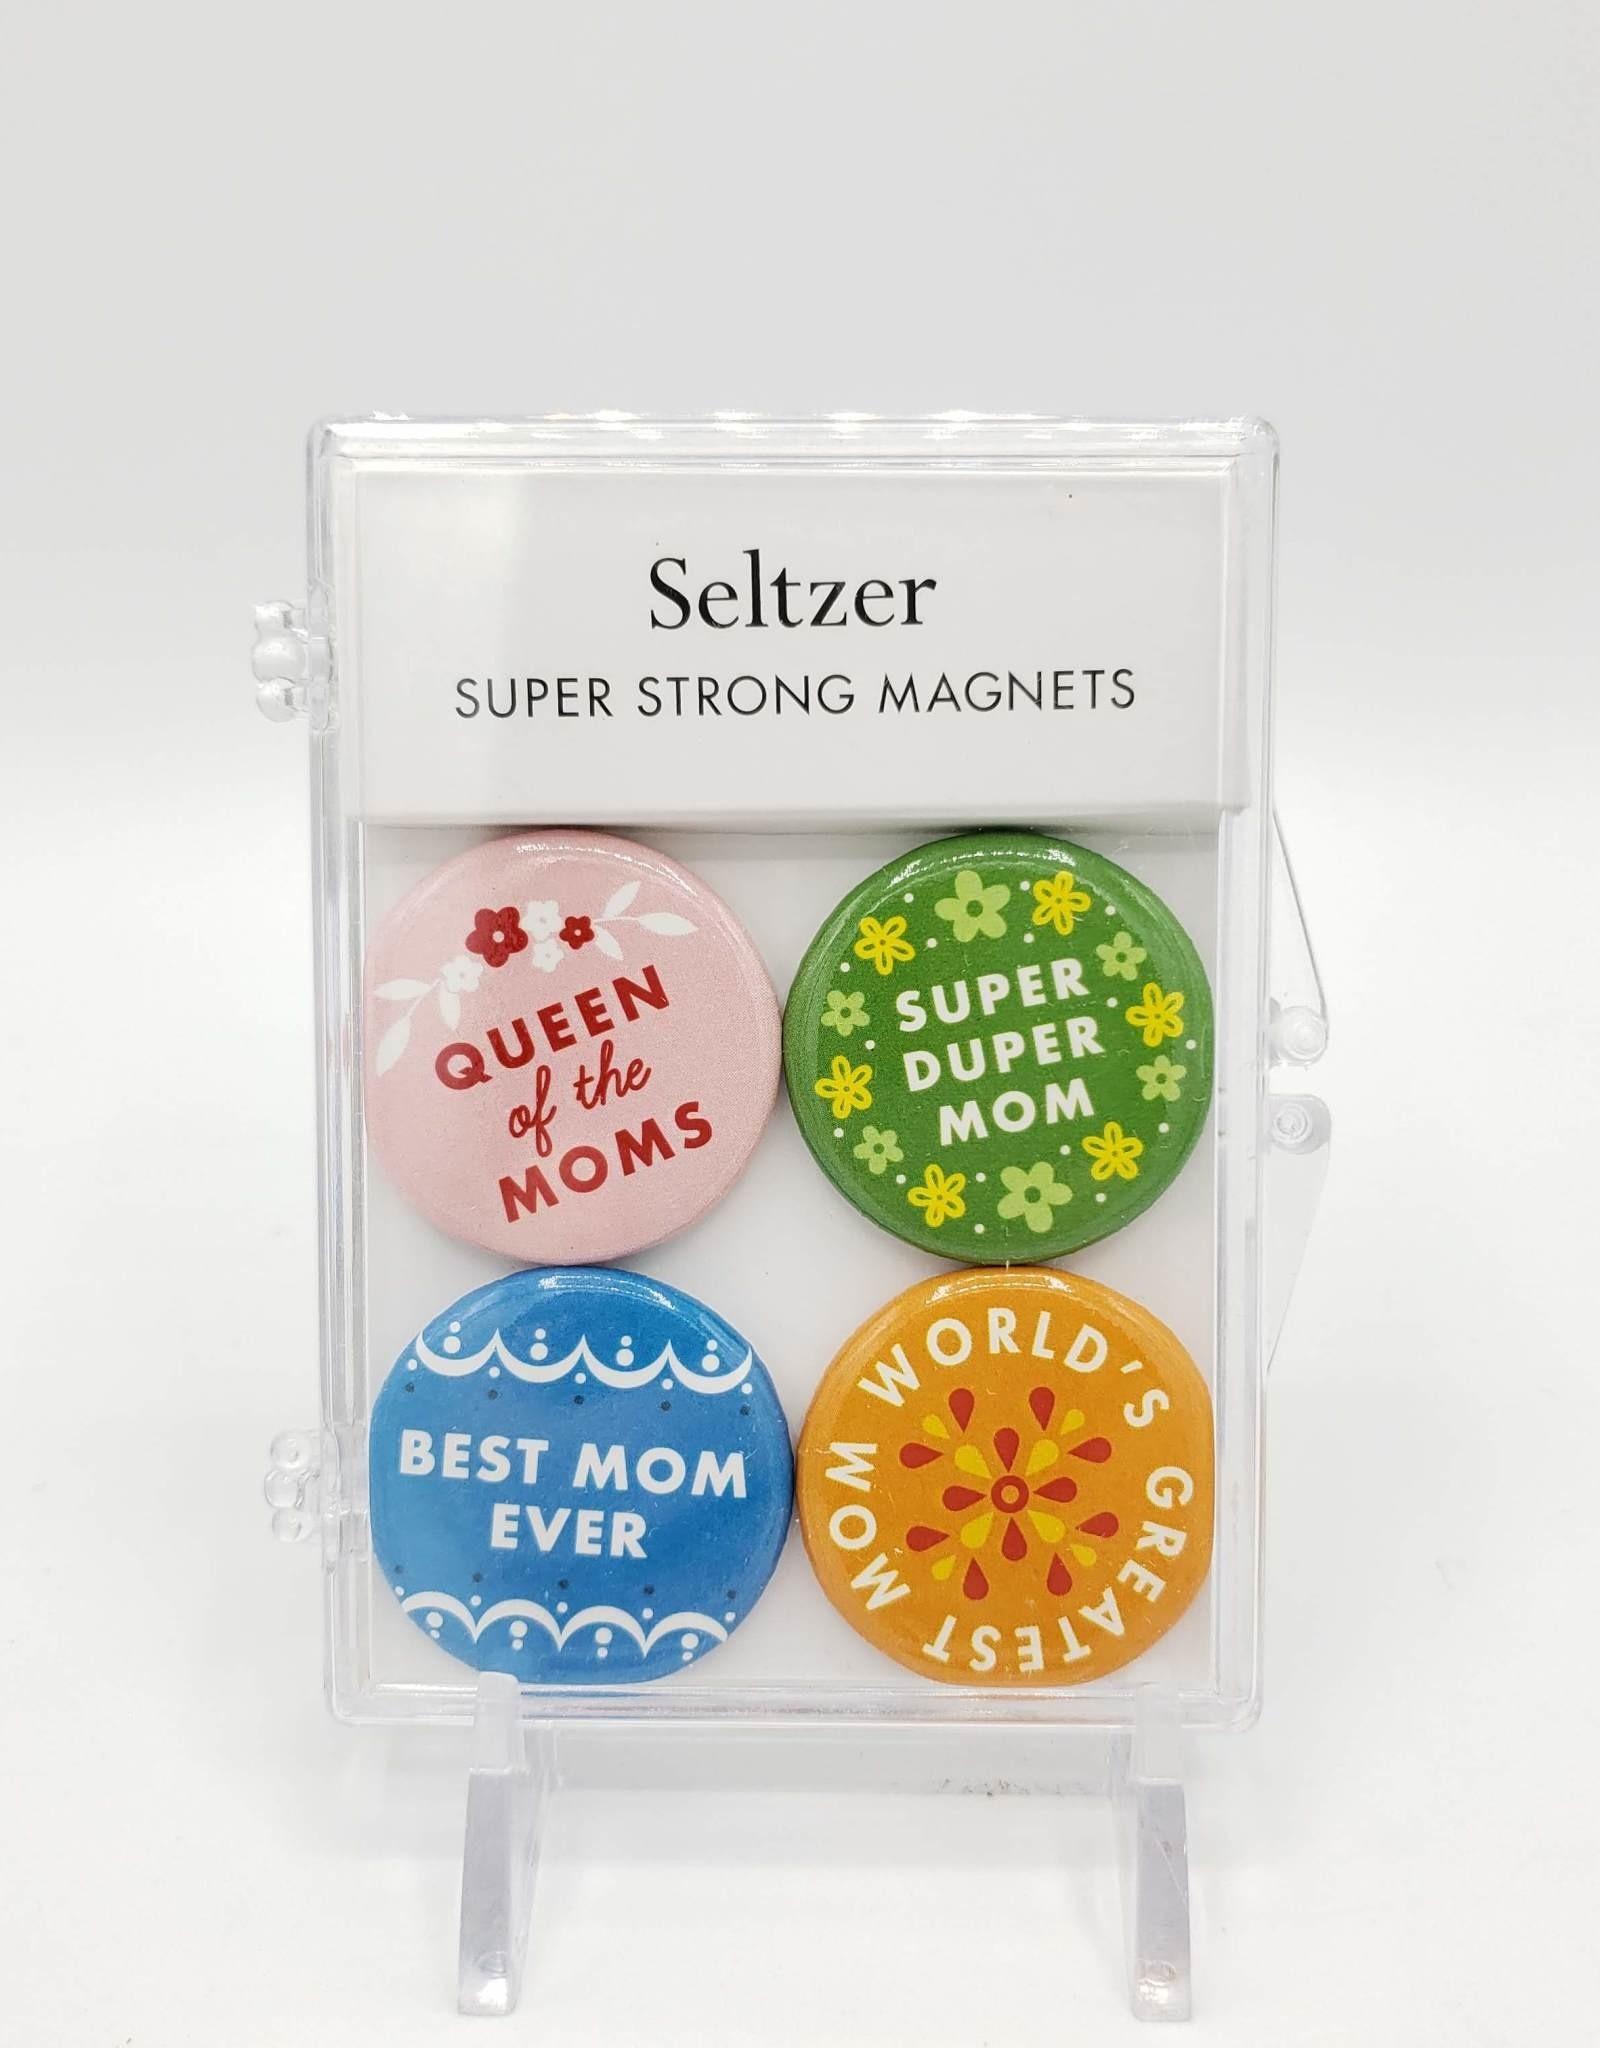 Seltzer Mom Magnet Set of 4 by Seltzer